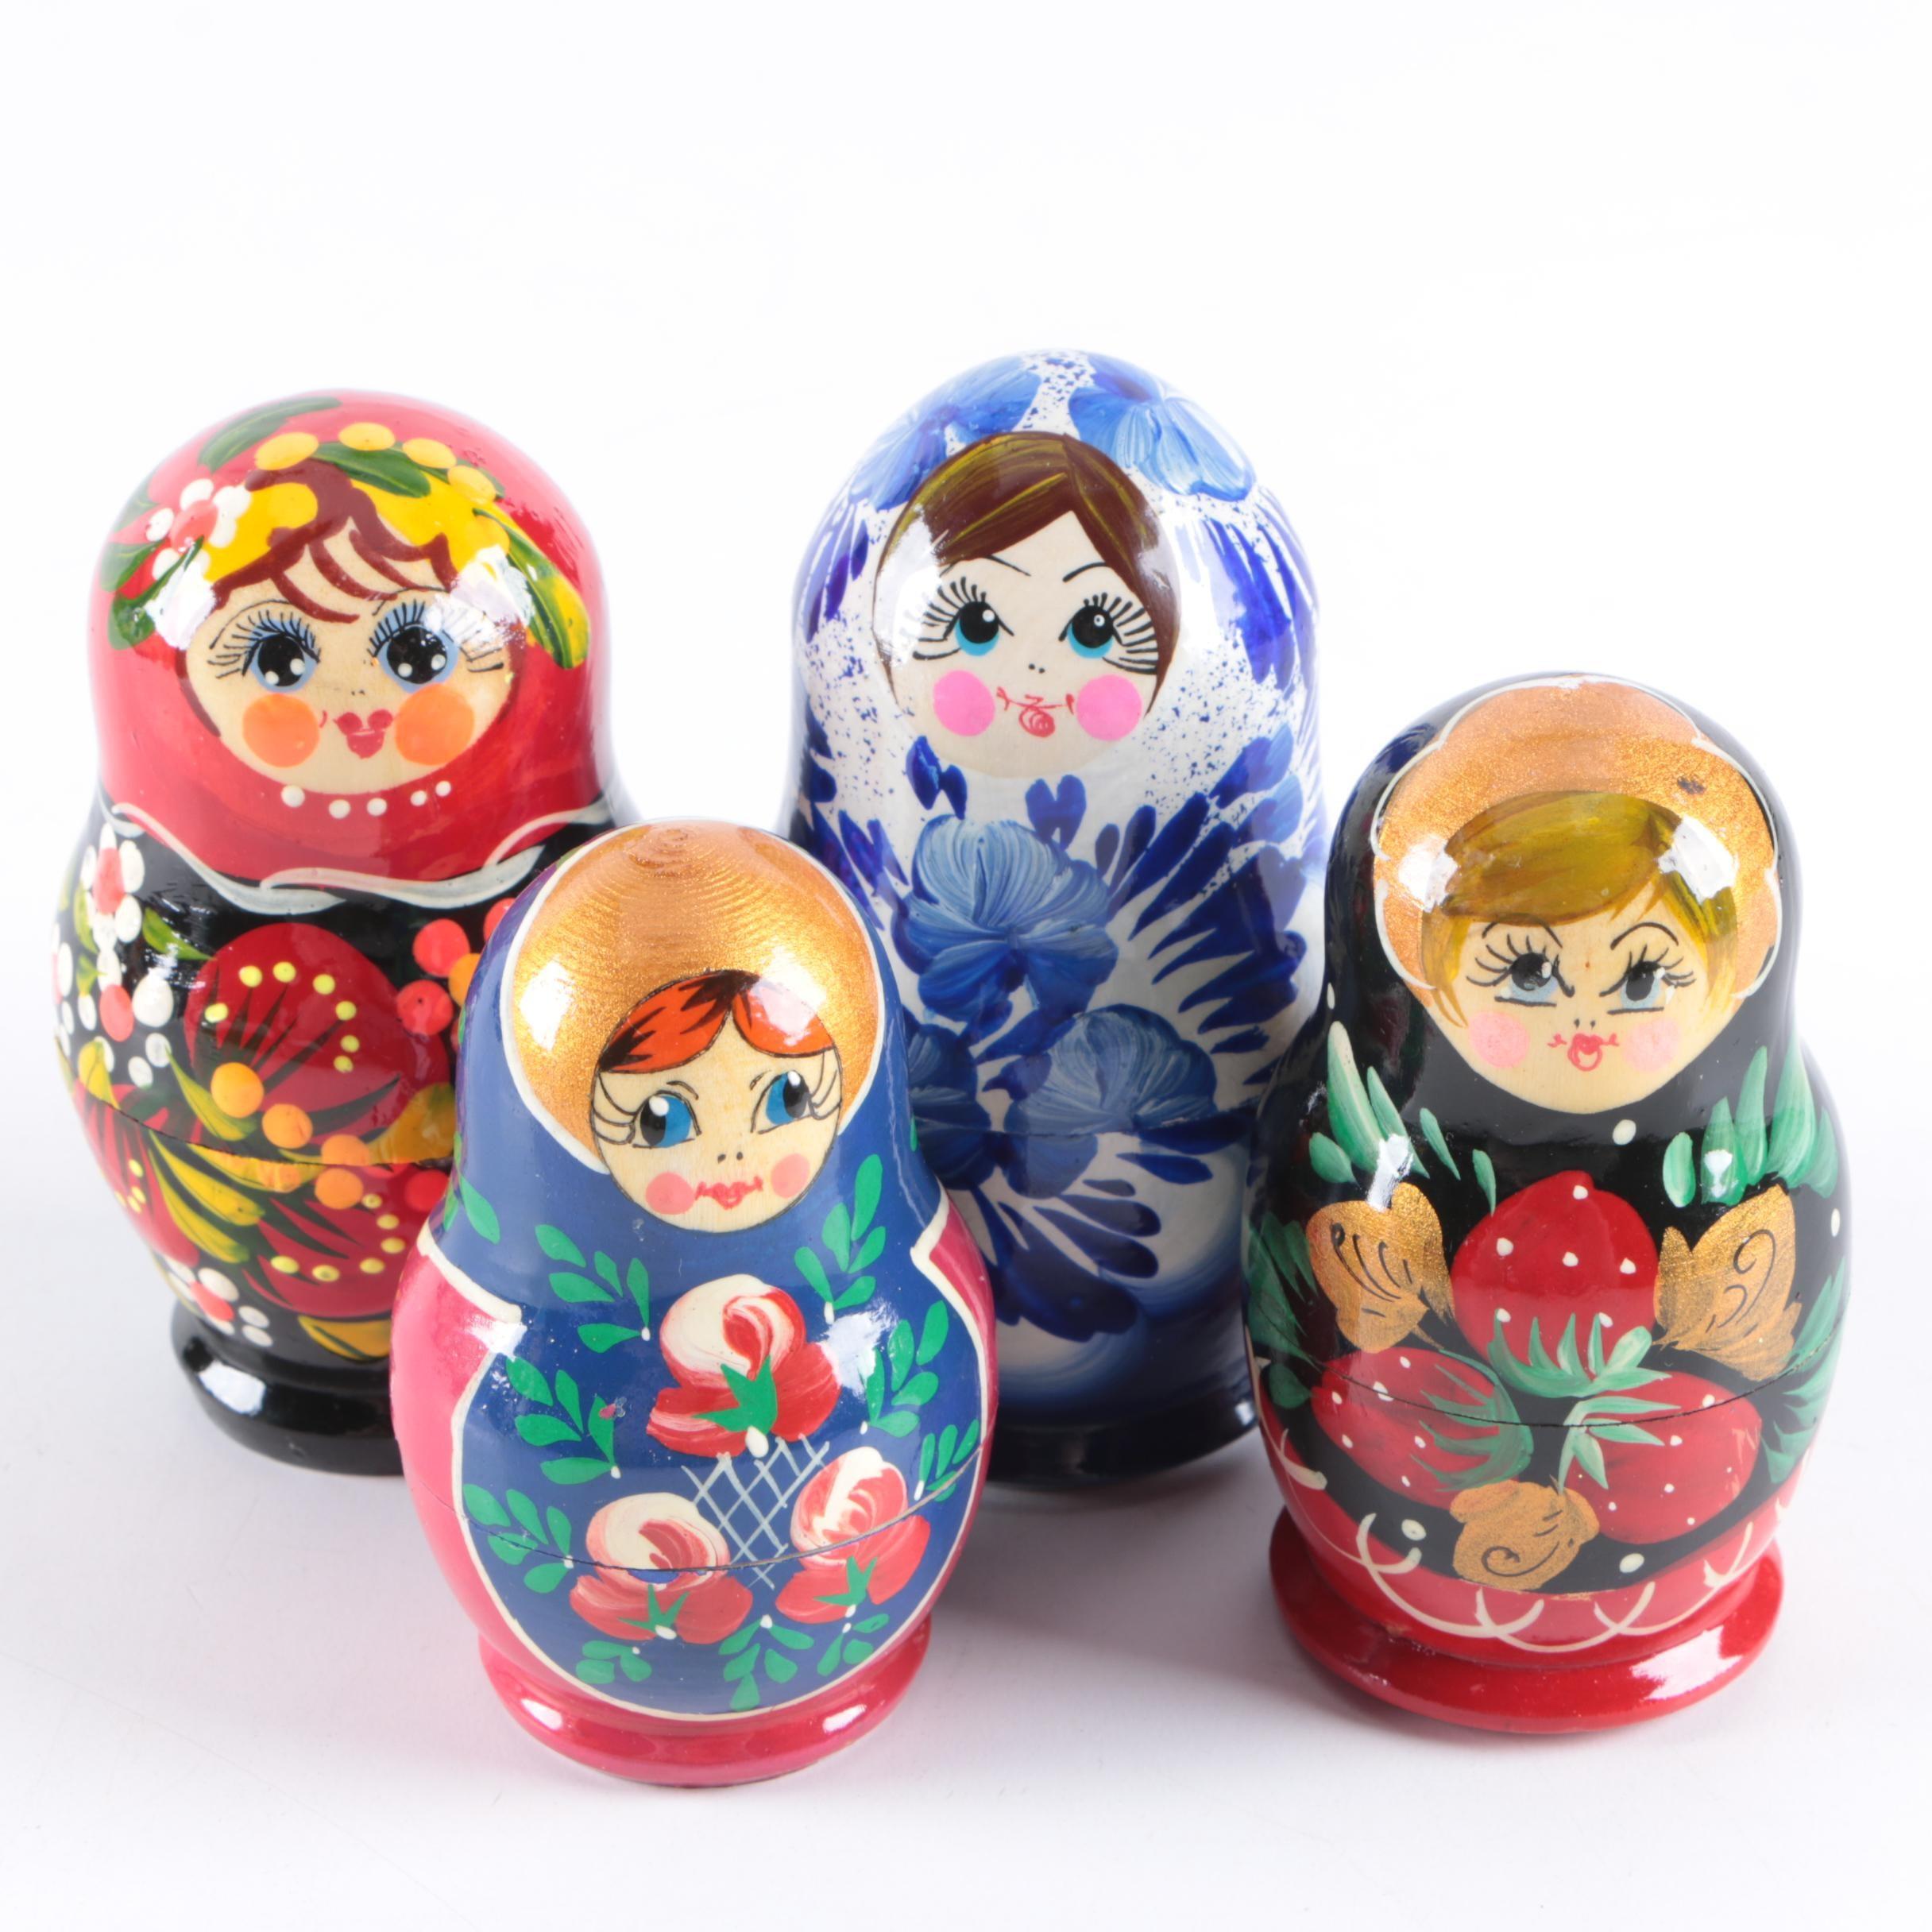 Vintage Hand-Painted Matryoshka Nesting Dolls